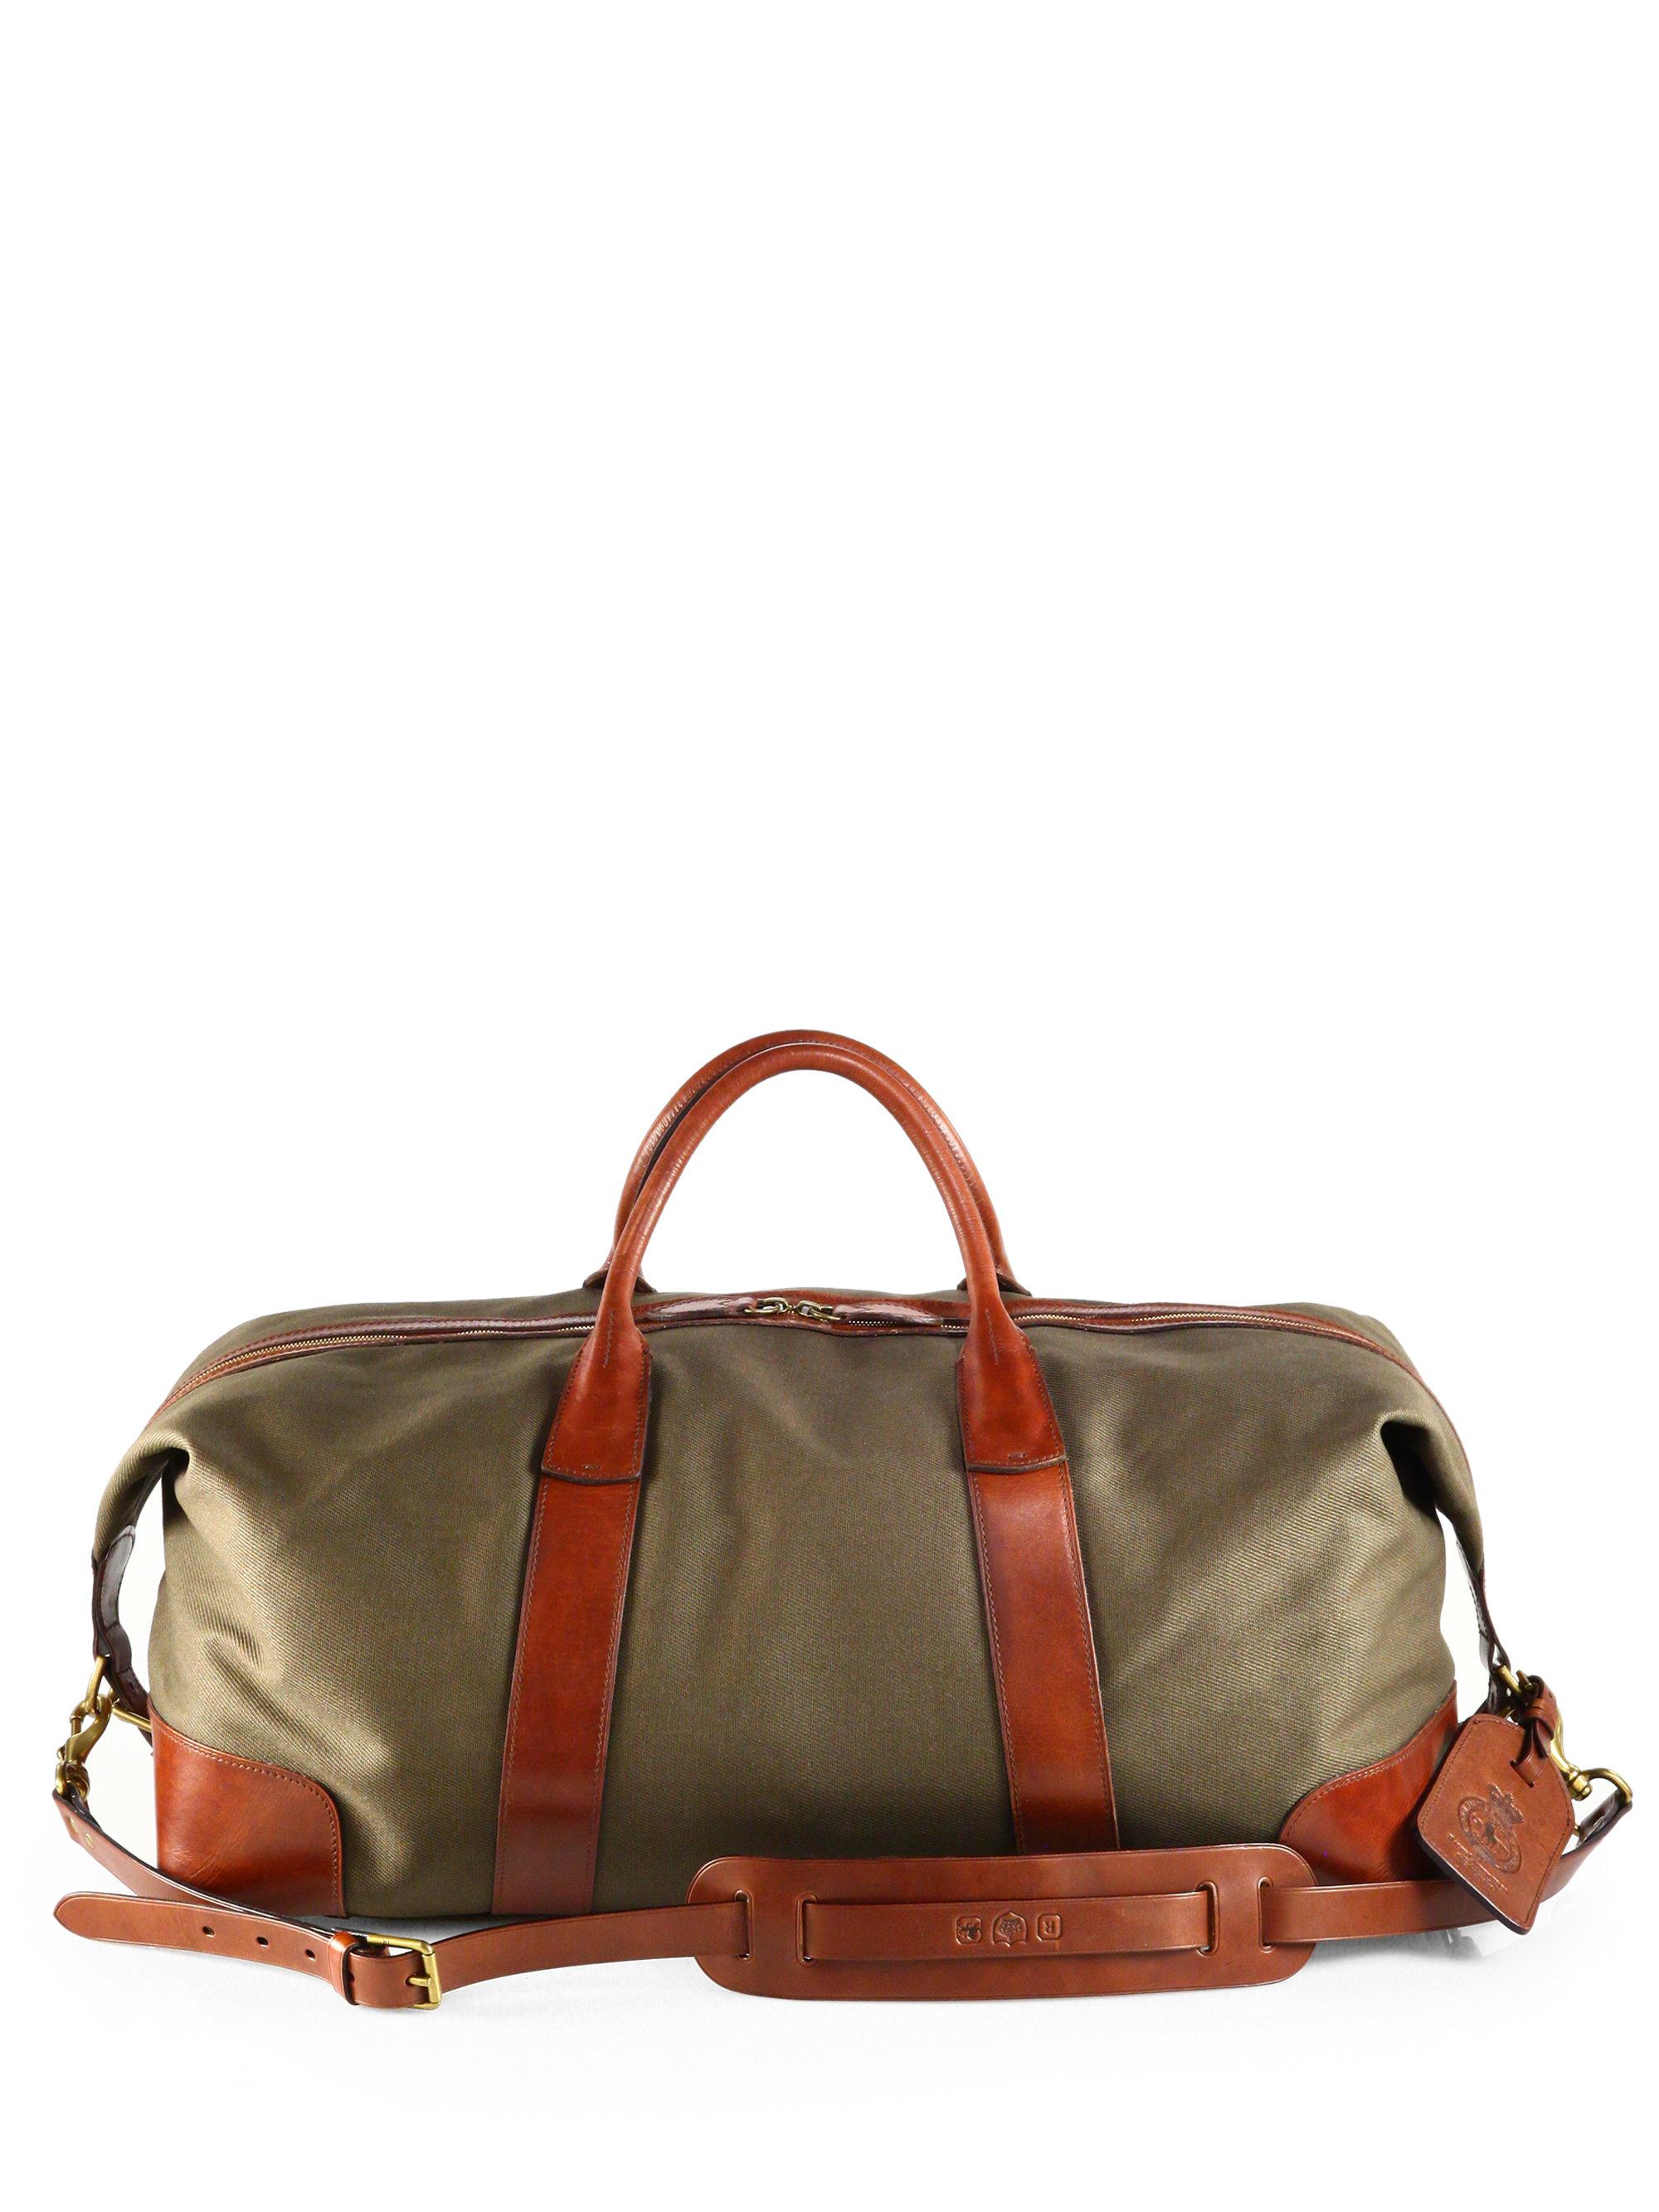 e44143b354a Lyst - Polo Ralph Lauren Waxed Twill Duffle Bag in Green for Men